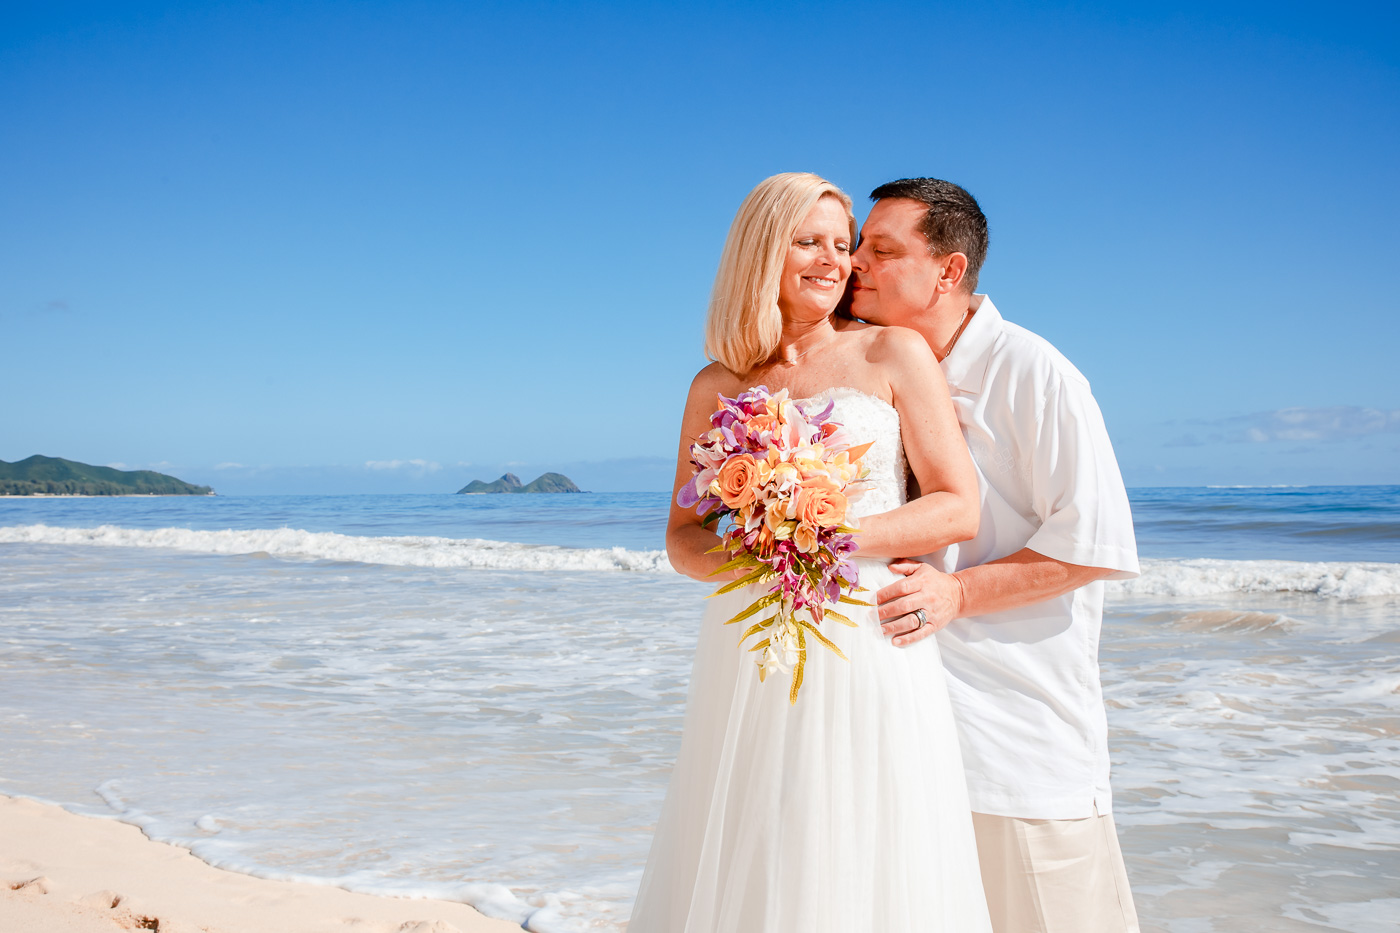 wedding-redux-41247.jpg